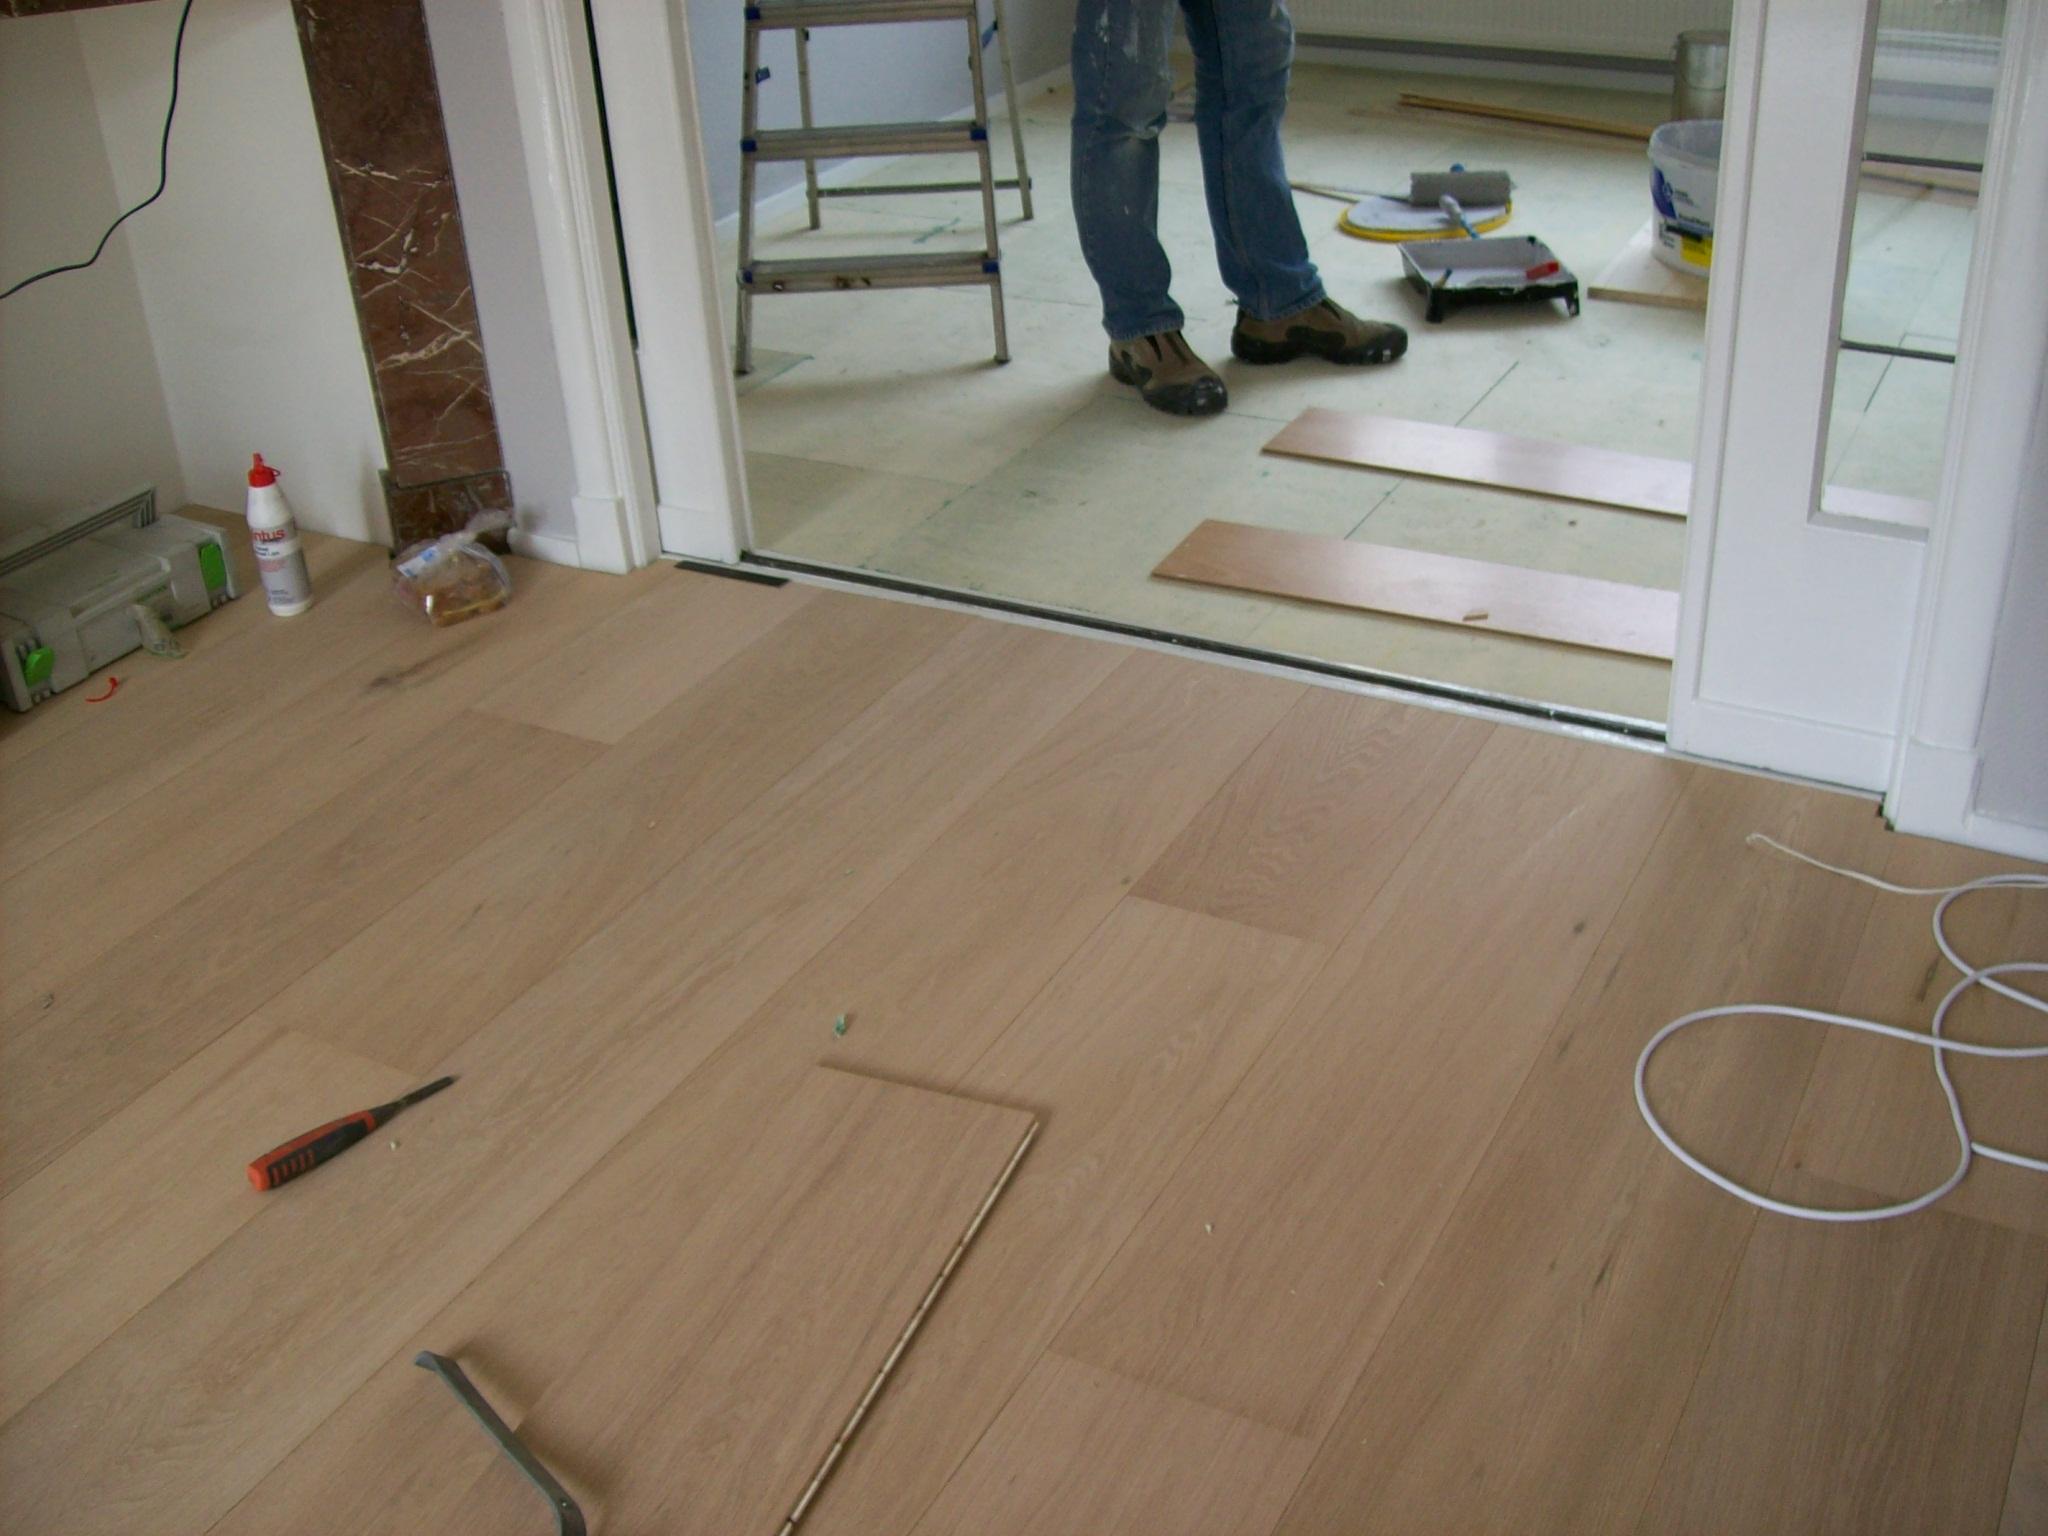 Pvc Vloeren Amersfoort : Parket laminaat nu parket houten vloeren laminaat pvc